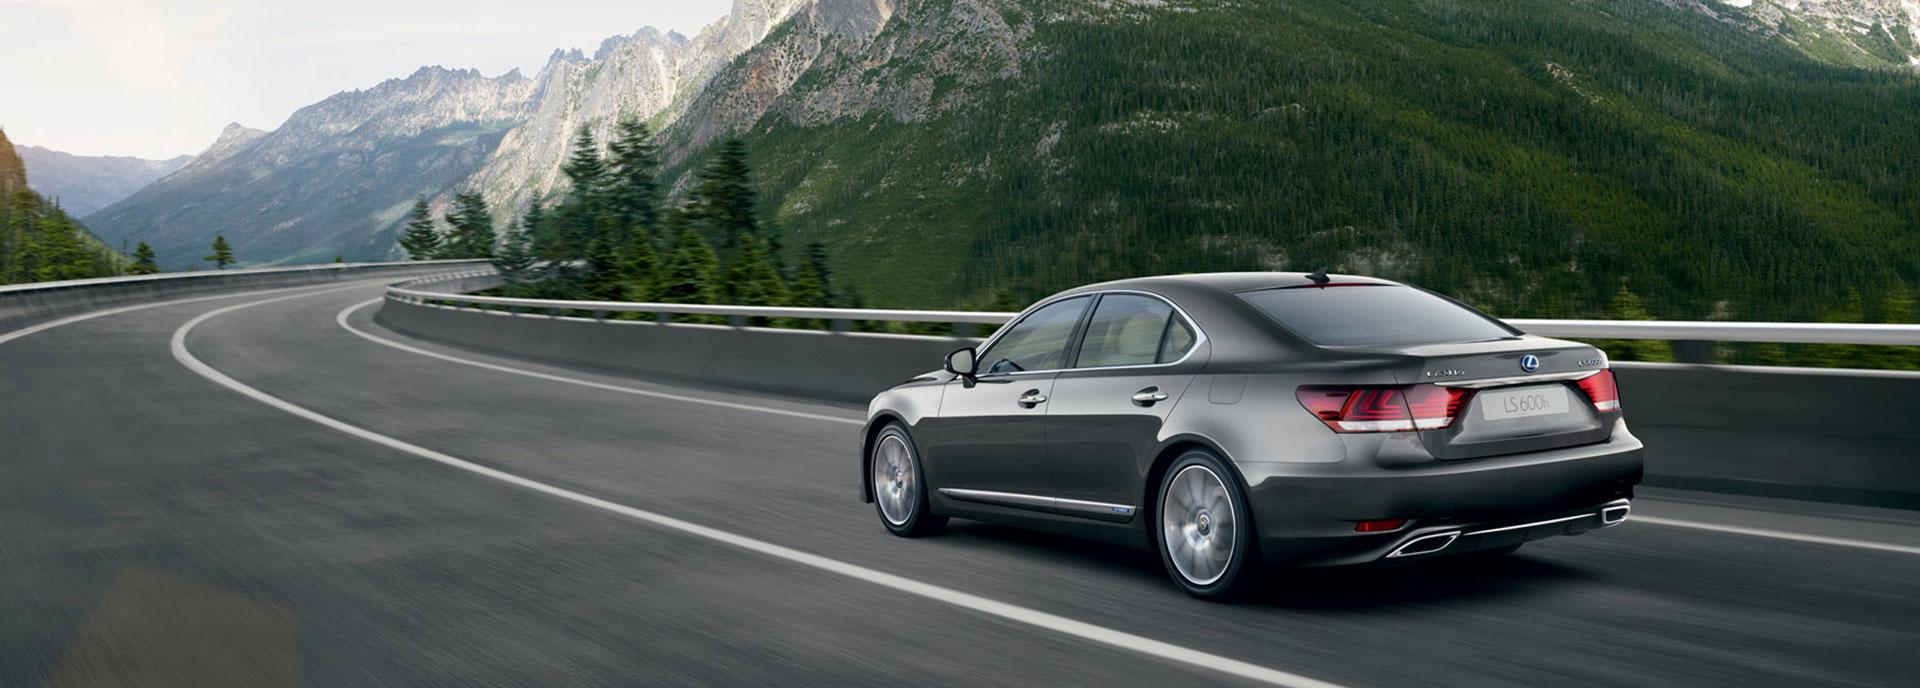 Lexus Hybrid Calgary